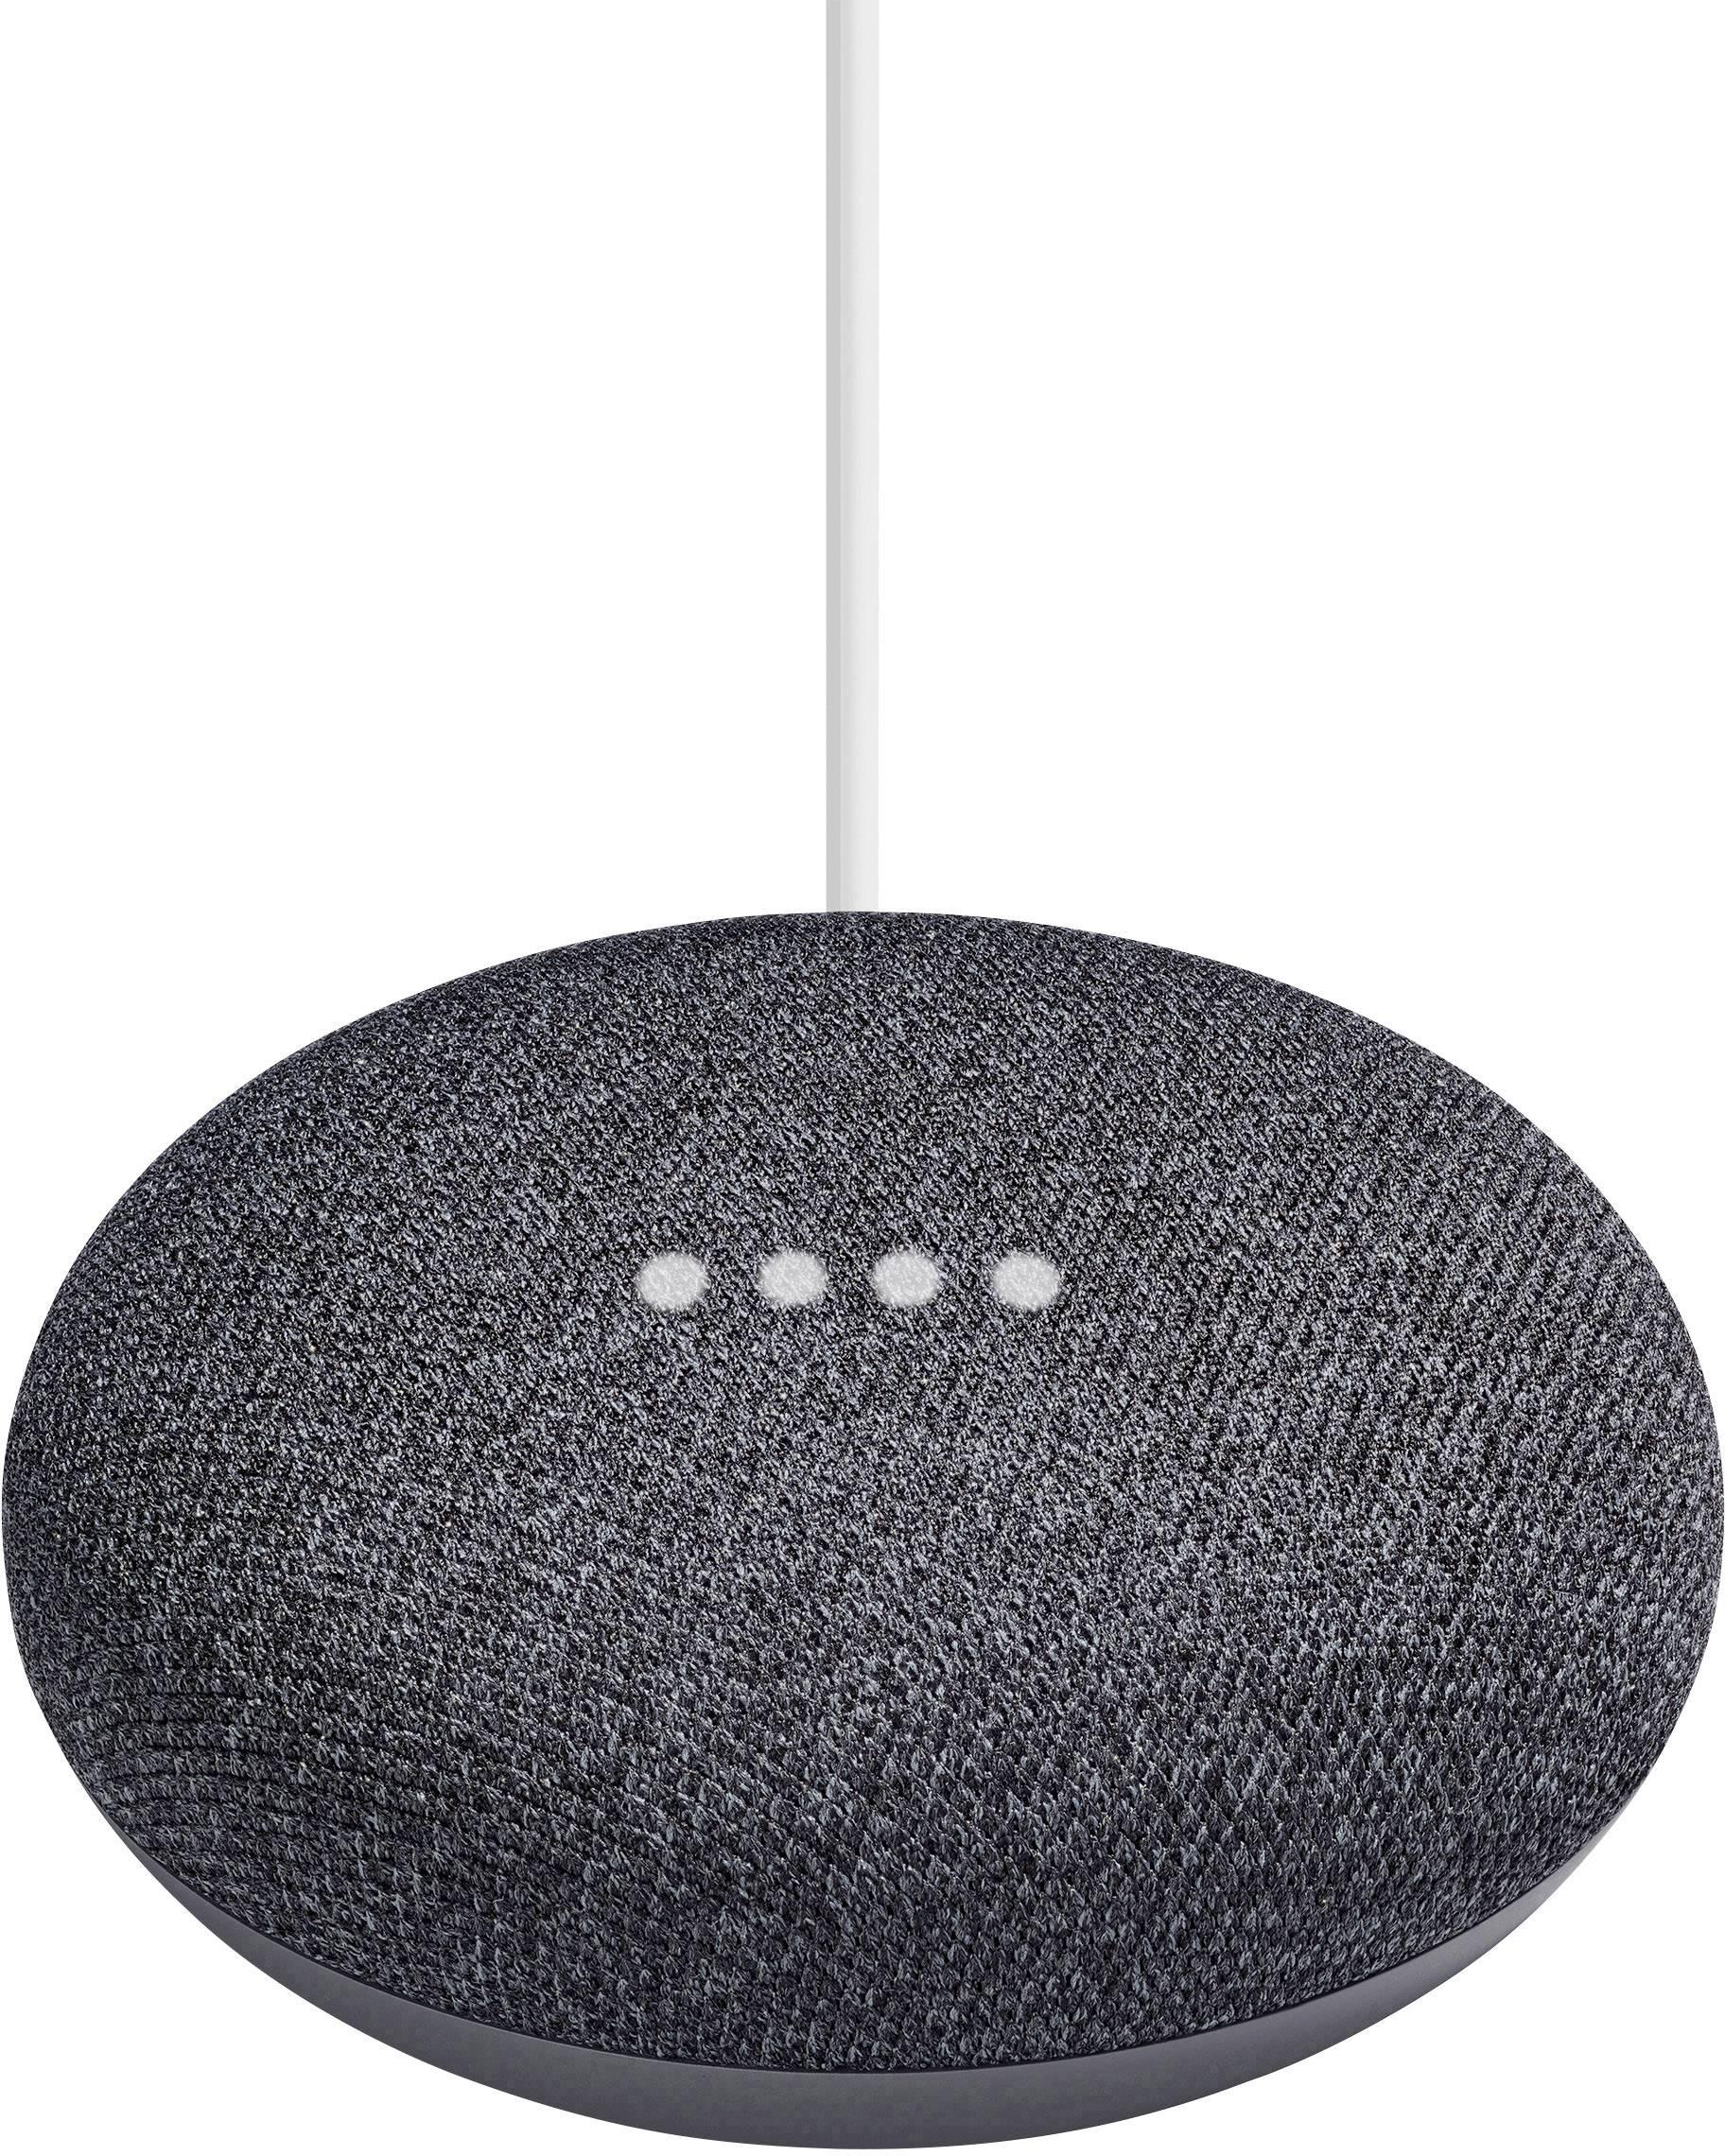 Google Home Mini Sprachassistent Karbon